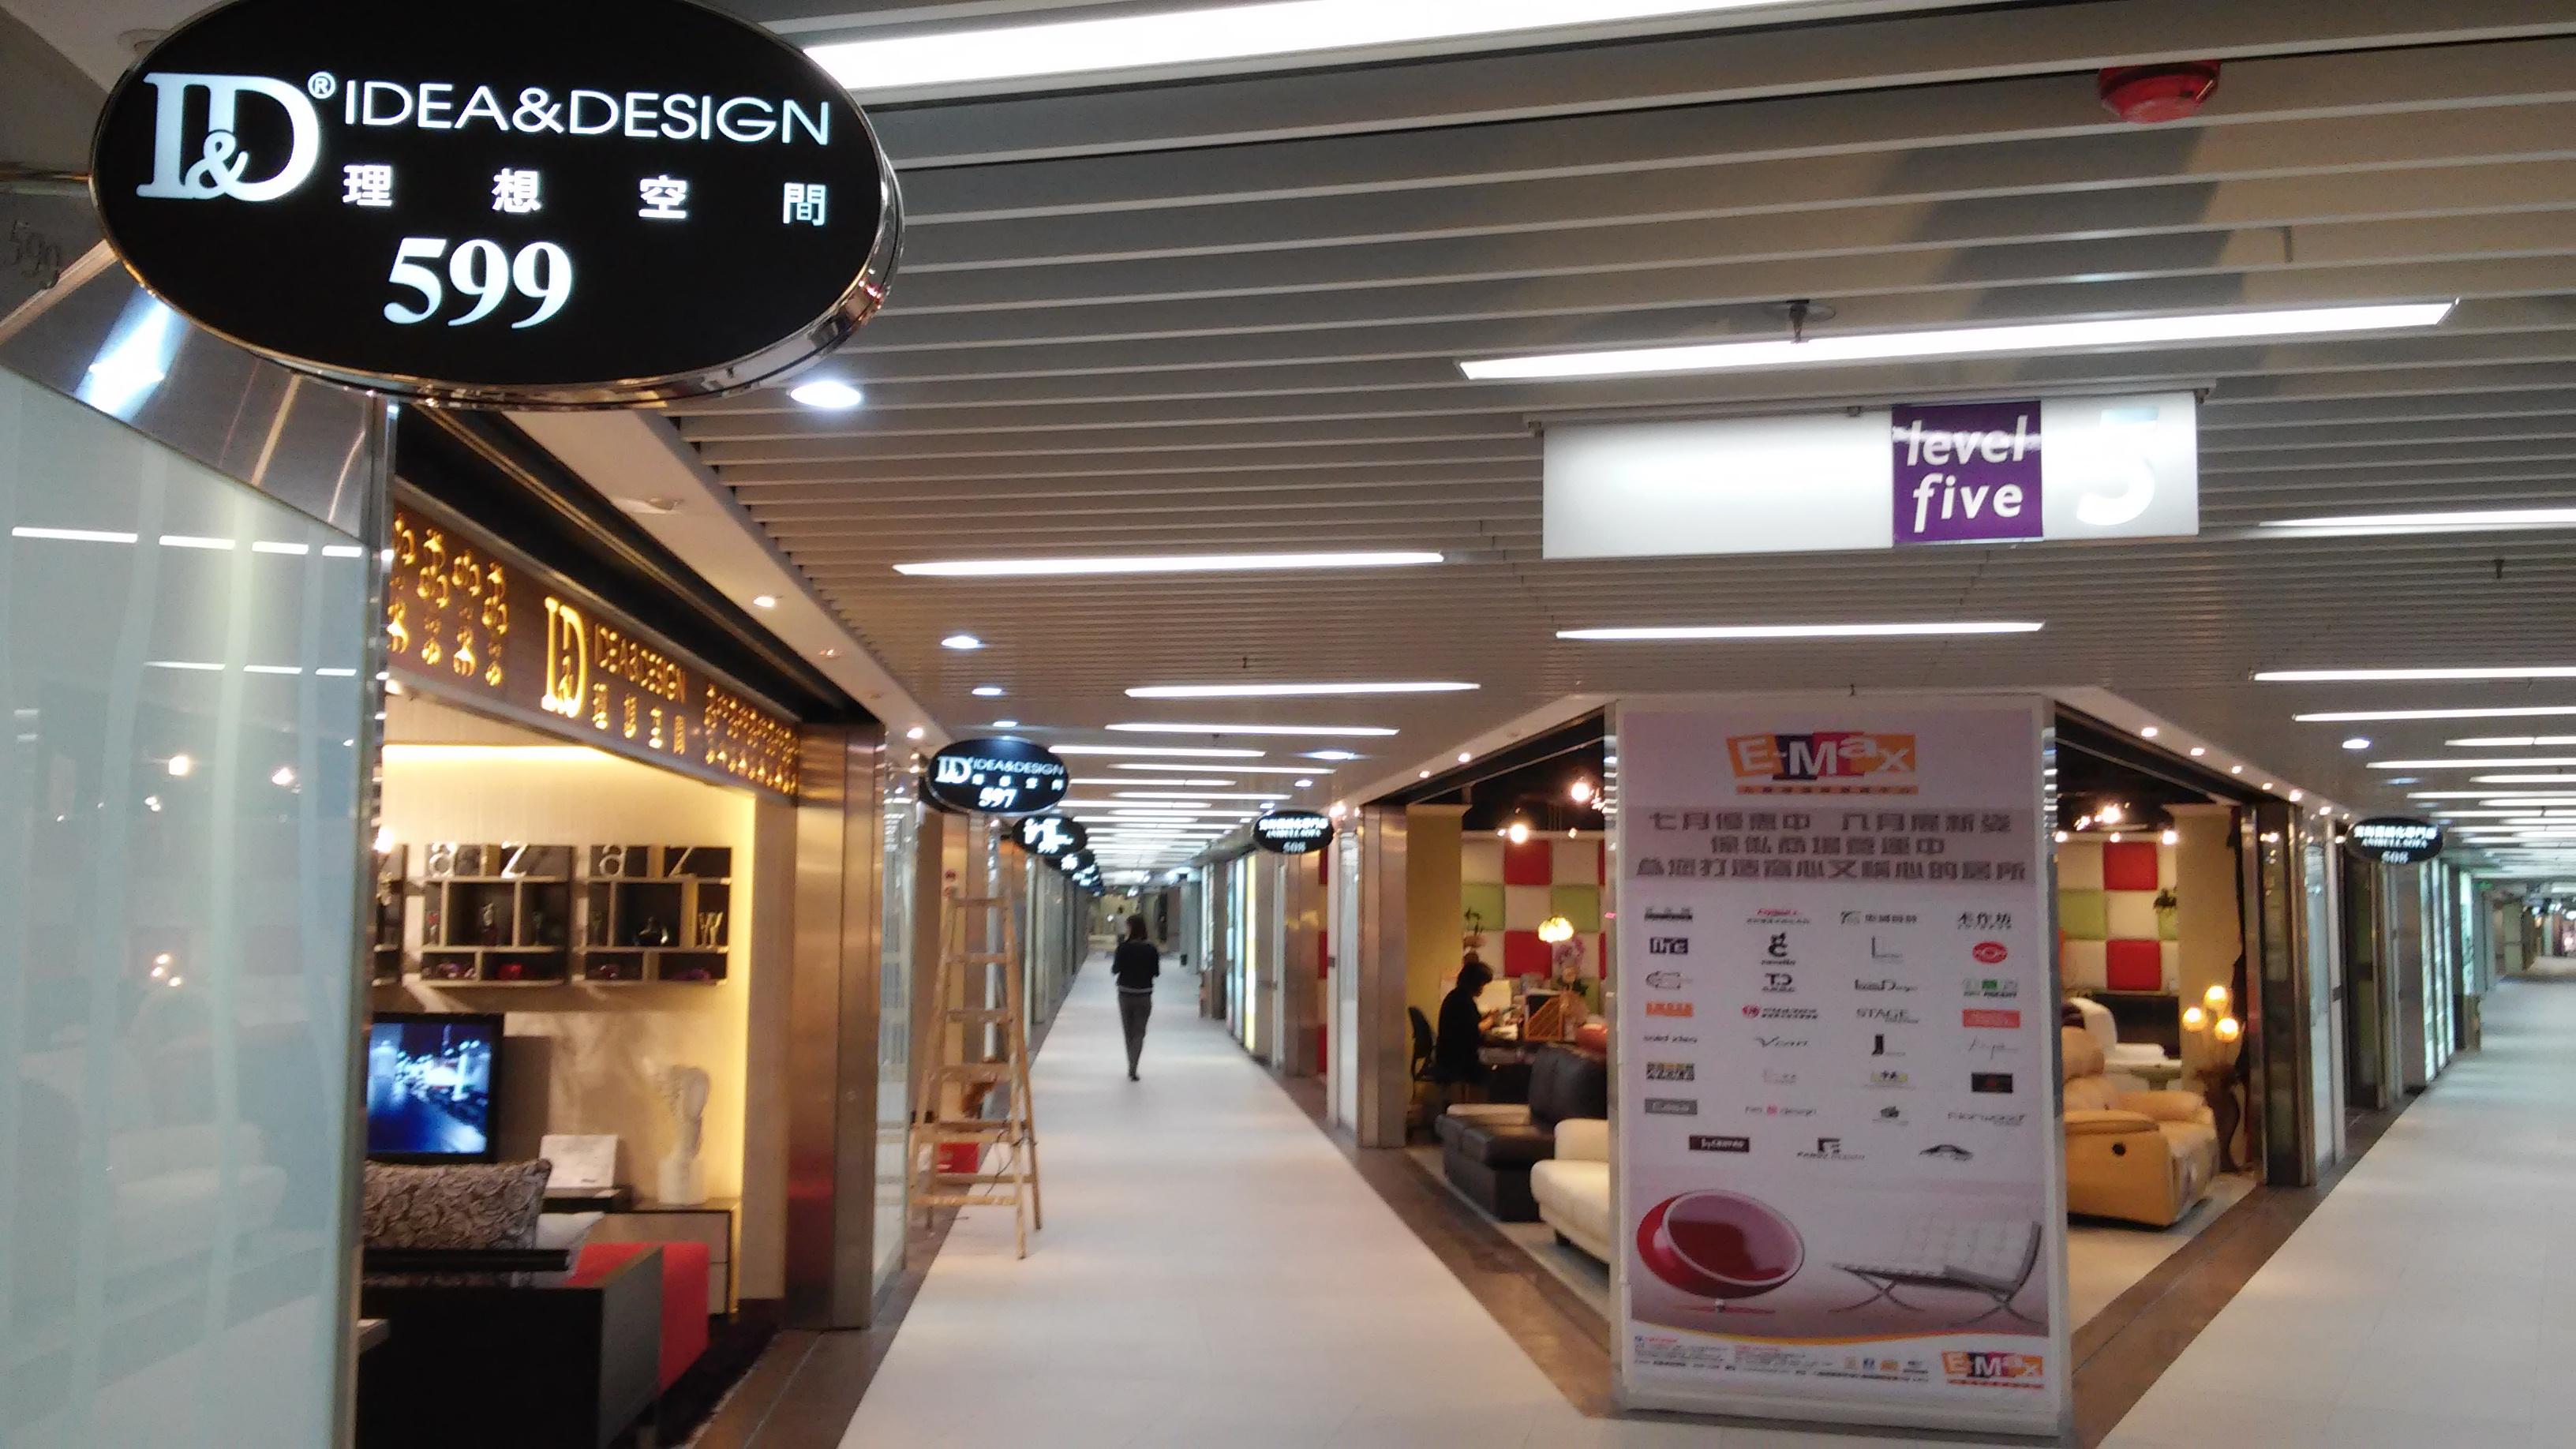 File HK Kln Bay Emax Home Shopping Mall Interior Nov 2014 LG2 Idea